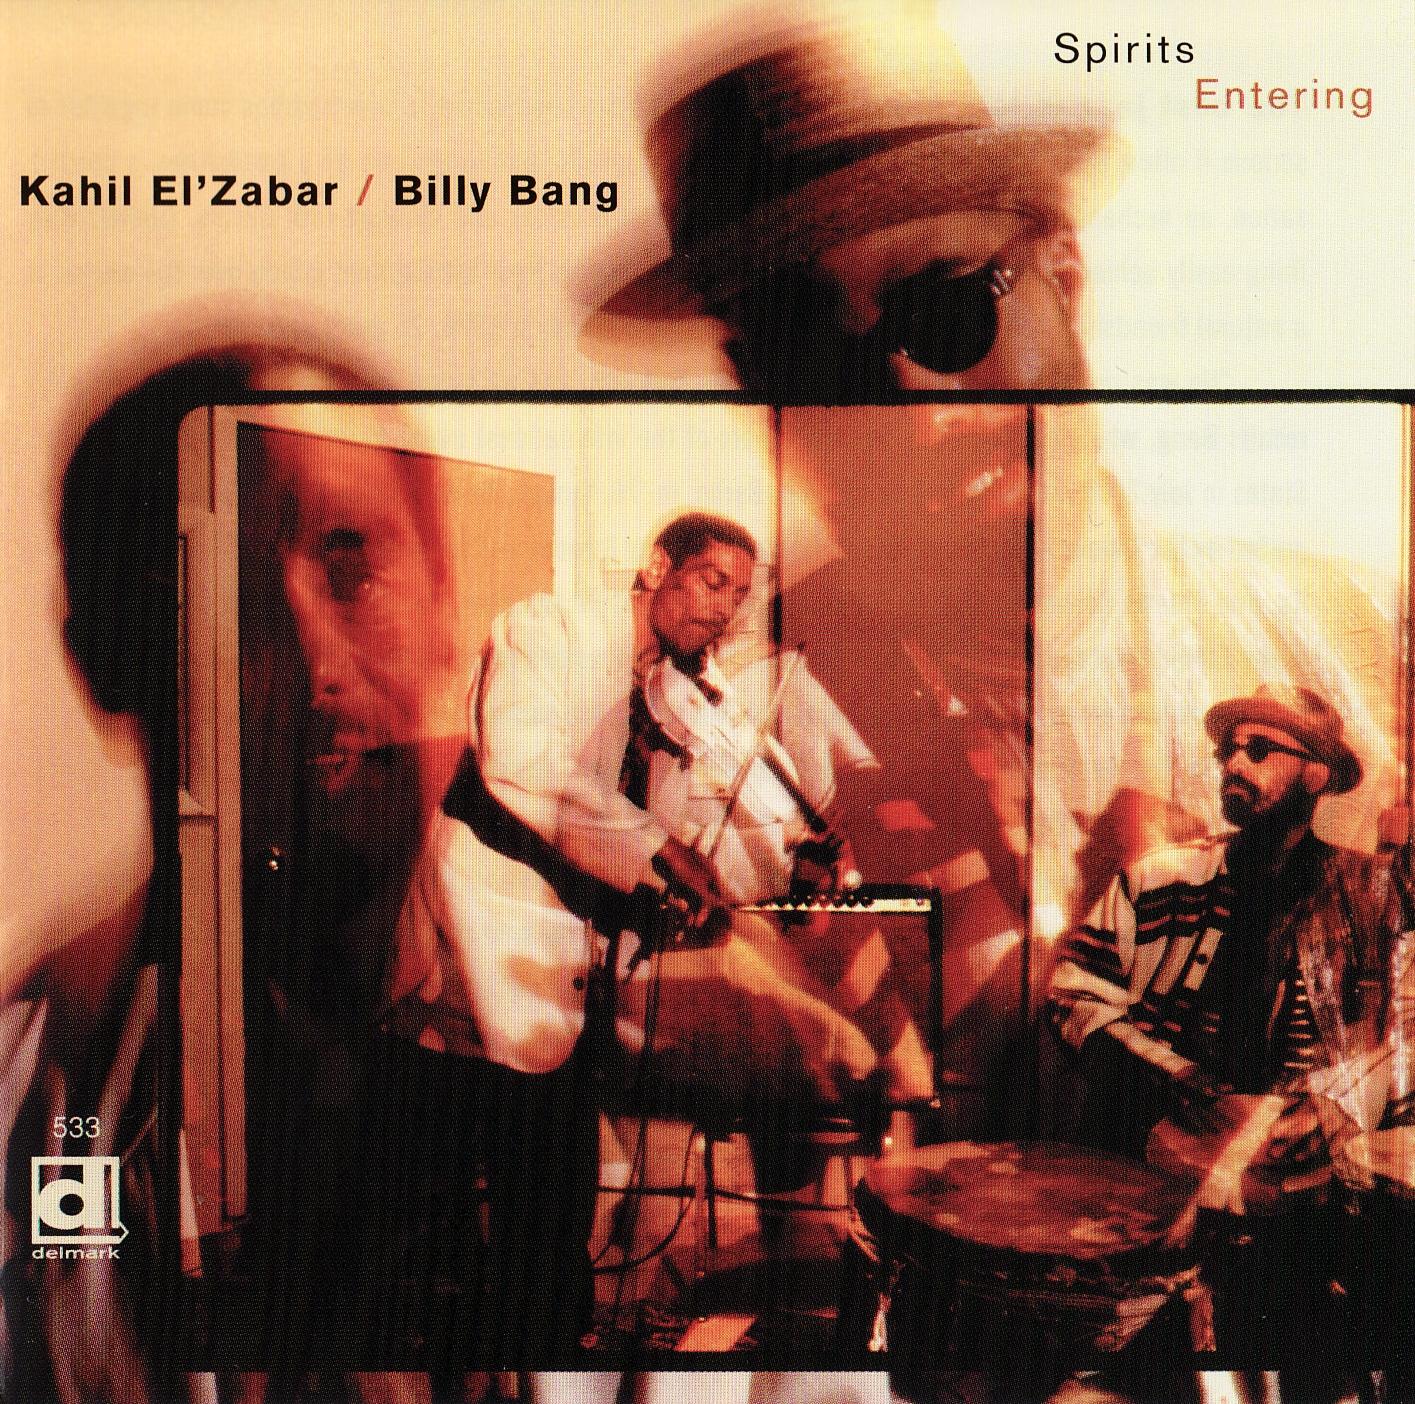 KAHIL EL'ZABAR - Kahil El'Zabar / Billy Bang : Spirits Entering cover